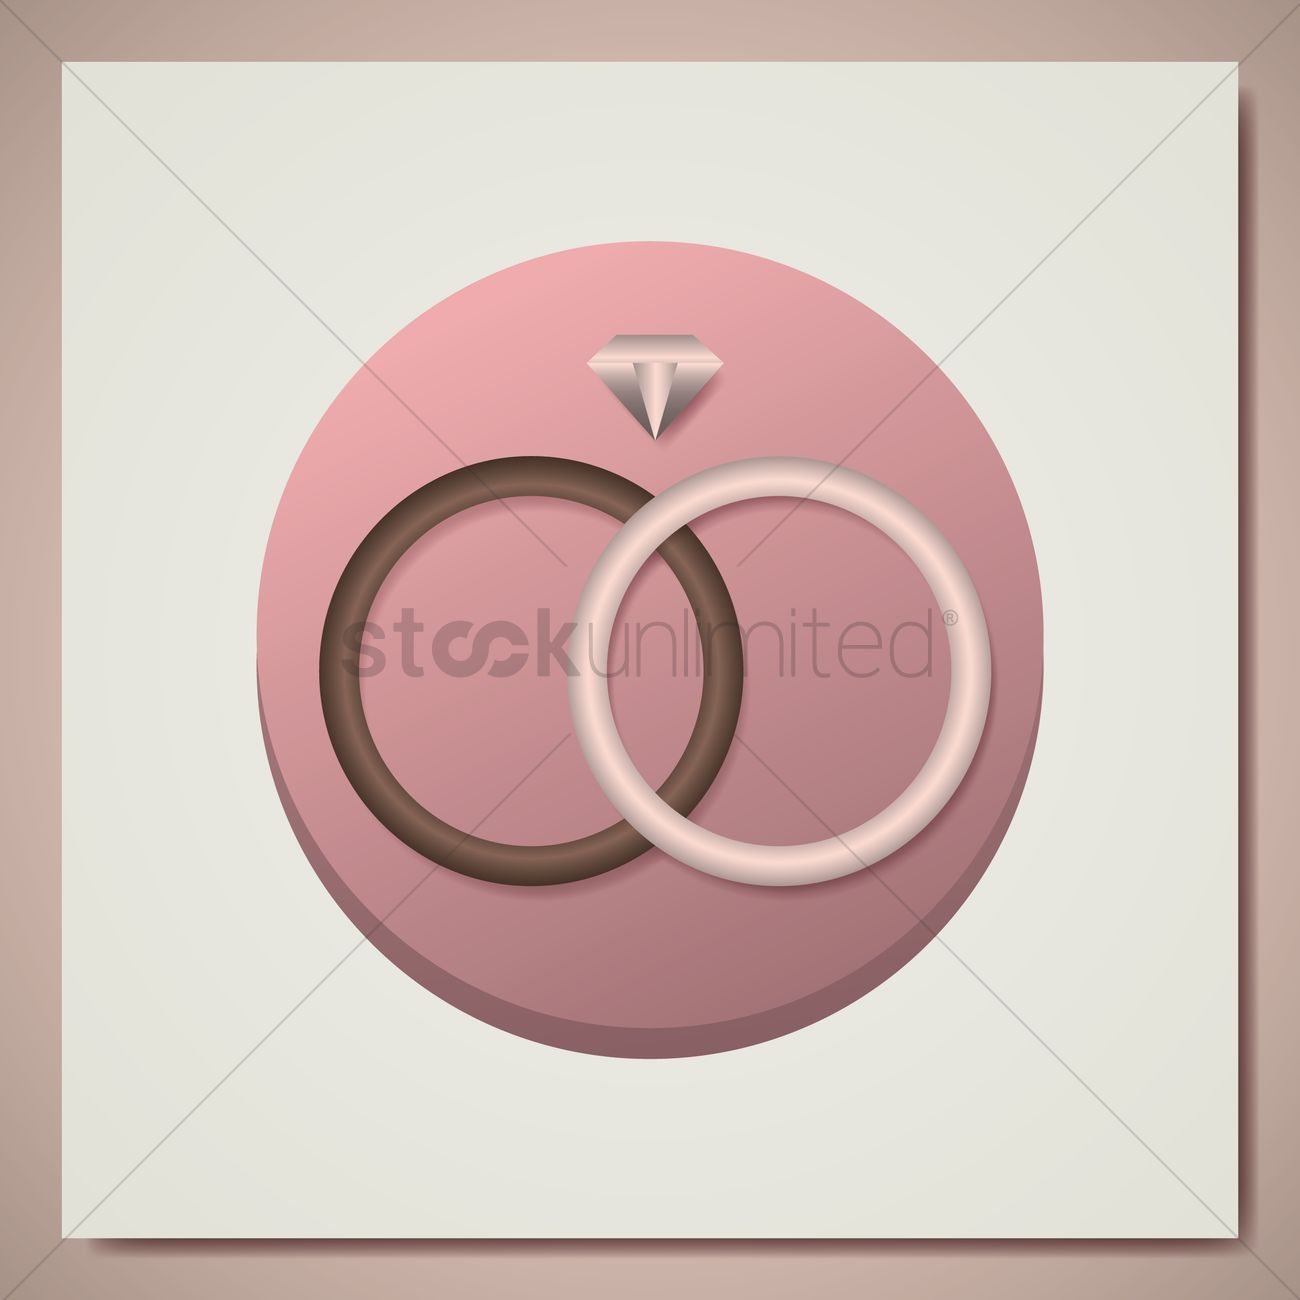 Wedding rings Vector Image - 1604267 | StockUnlimited